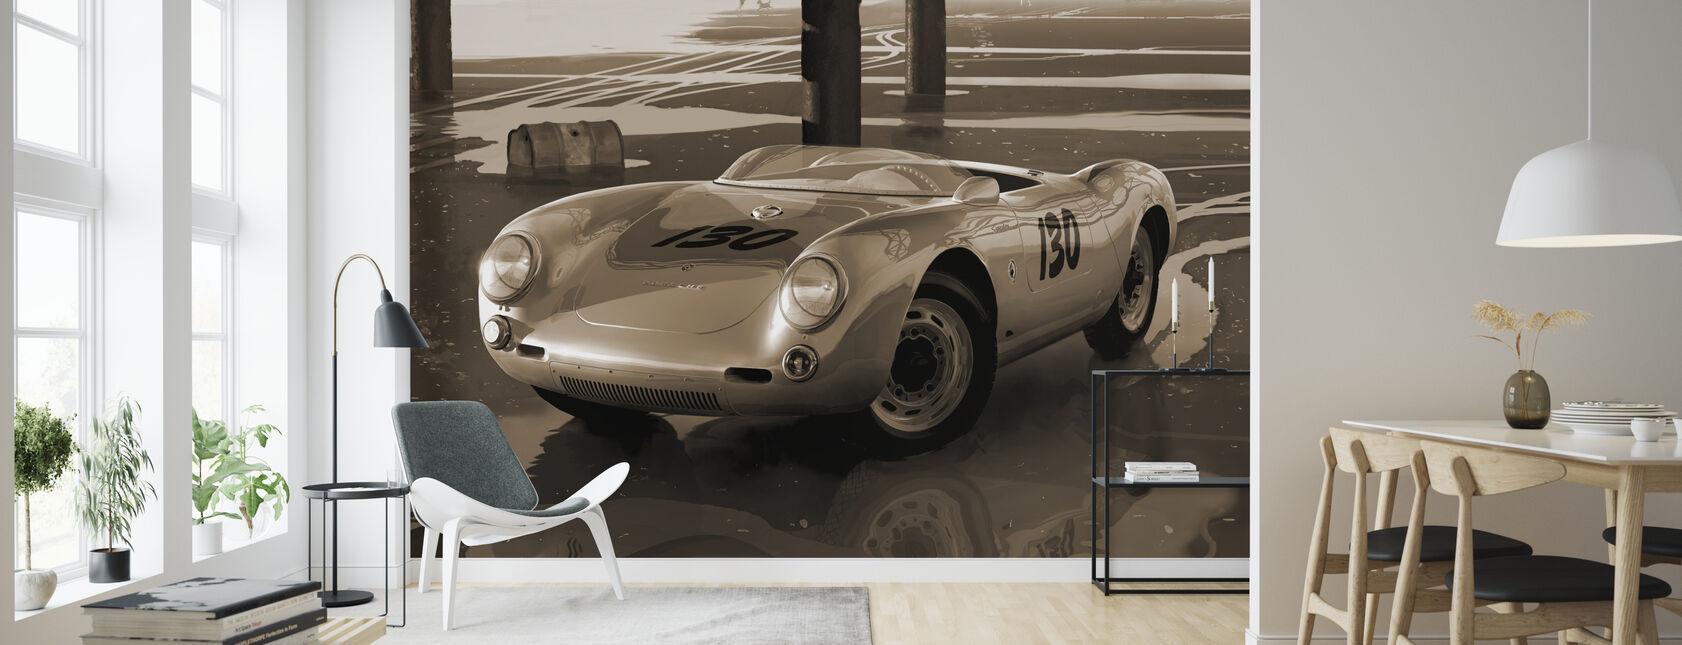 Jimmys car Sepia - Wallpaper - Living Room